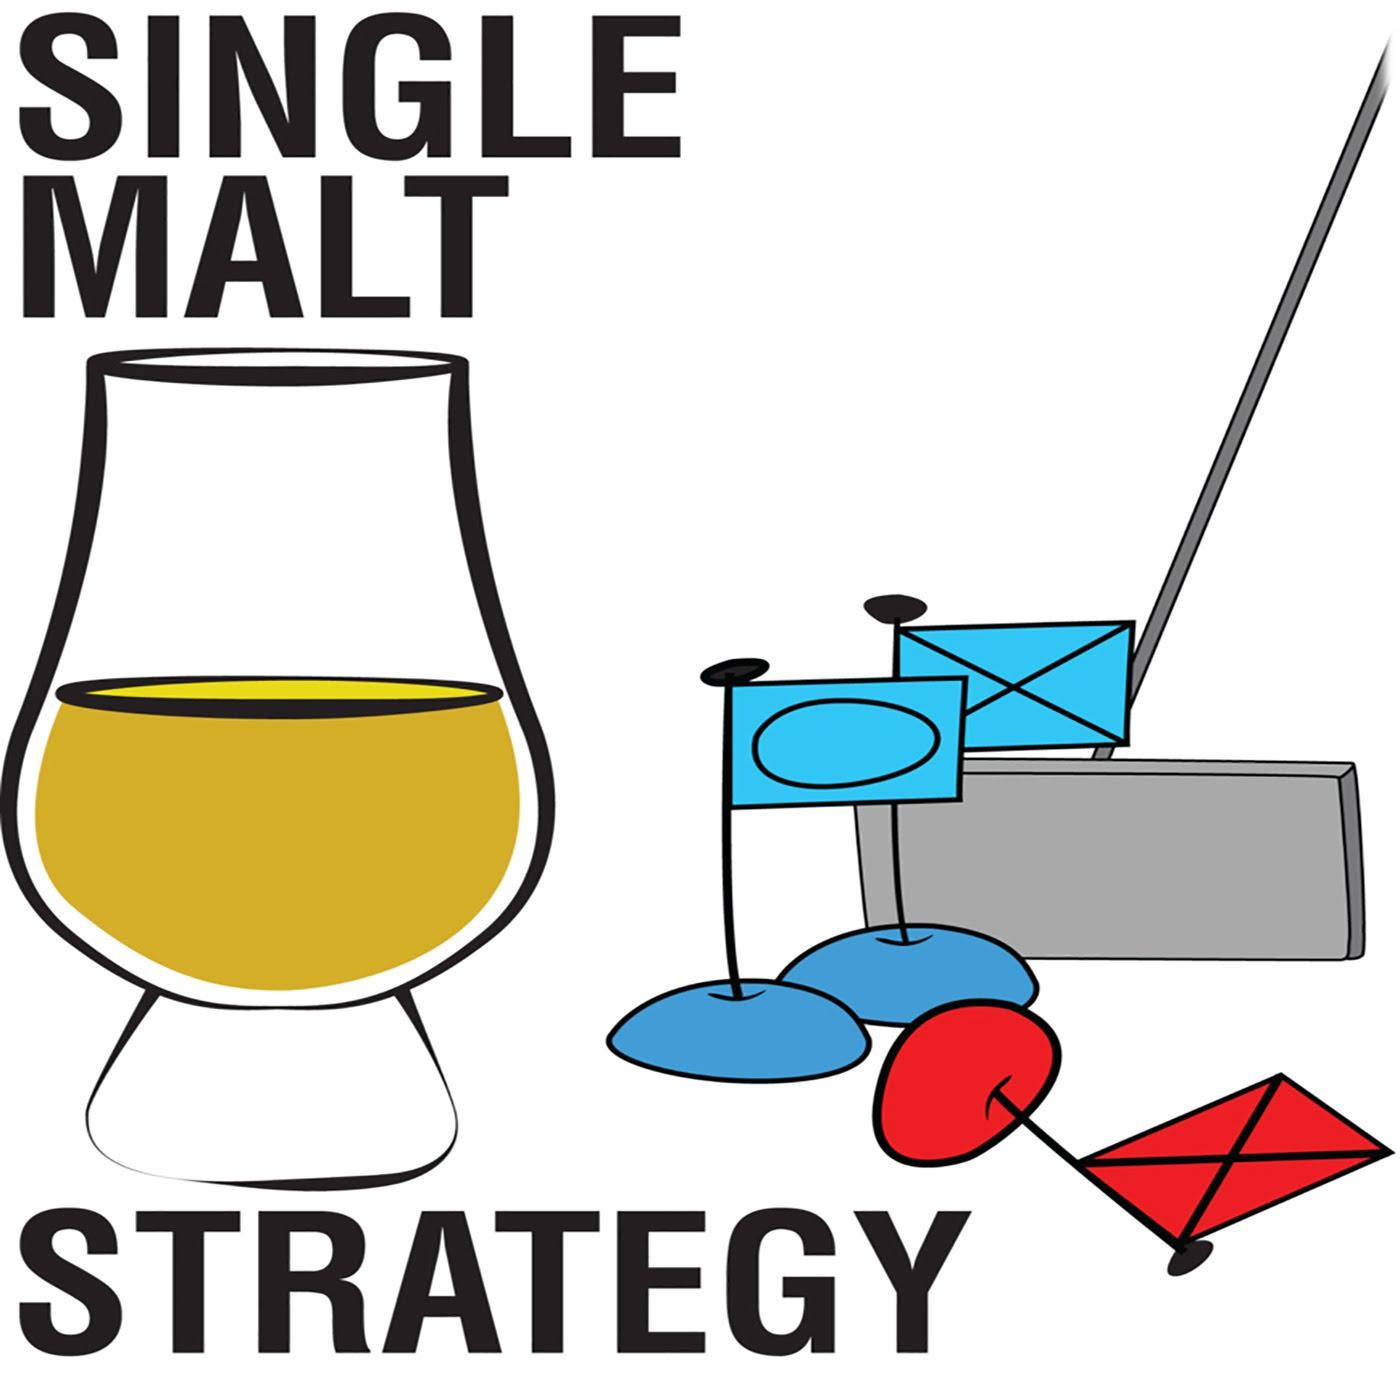 1400x1400 Single Malt Strategy 1 Why We Game